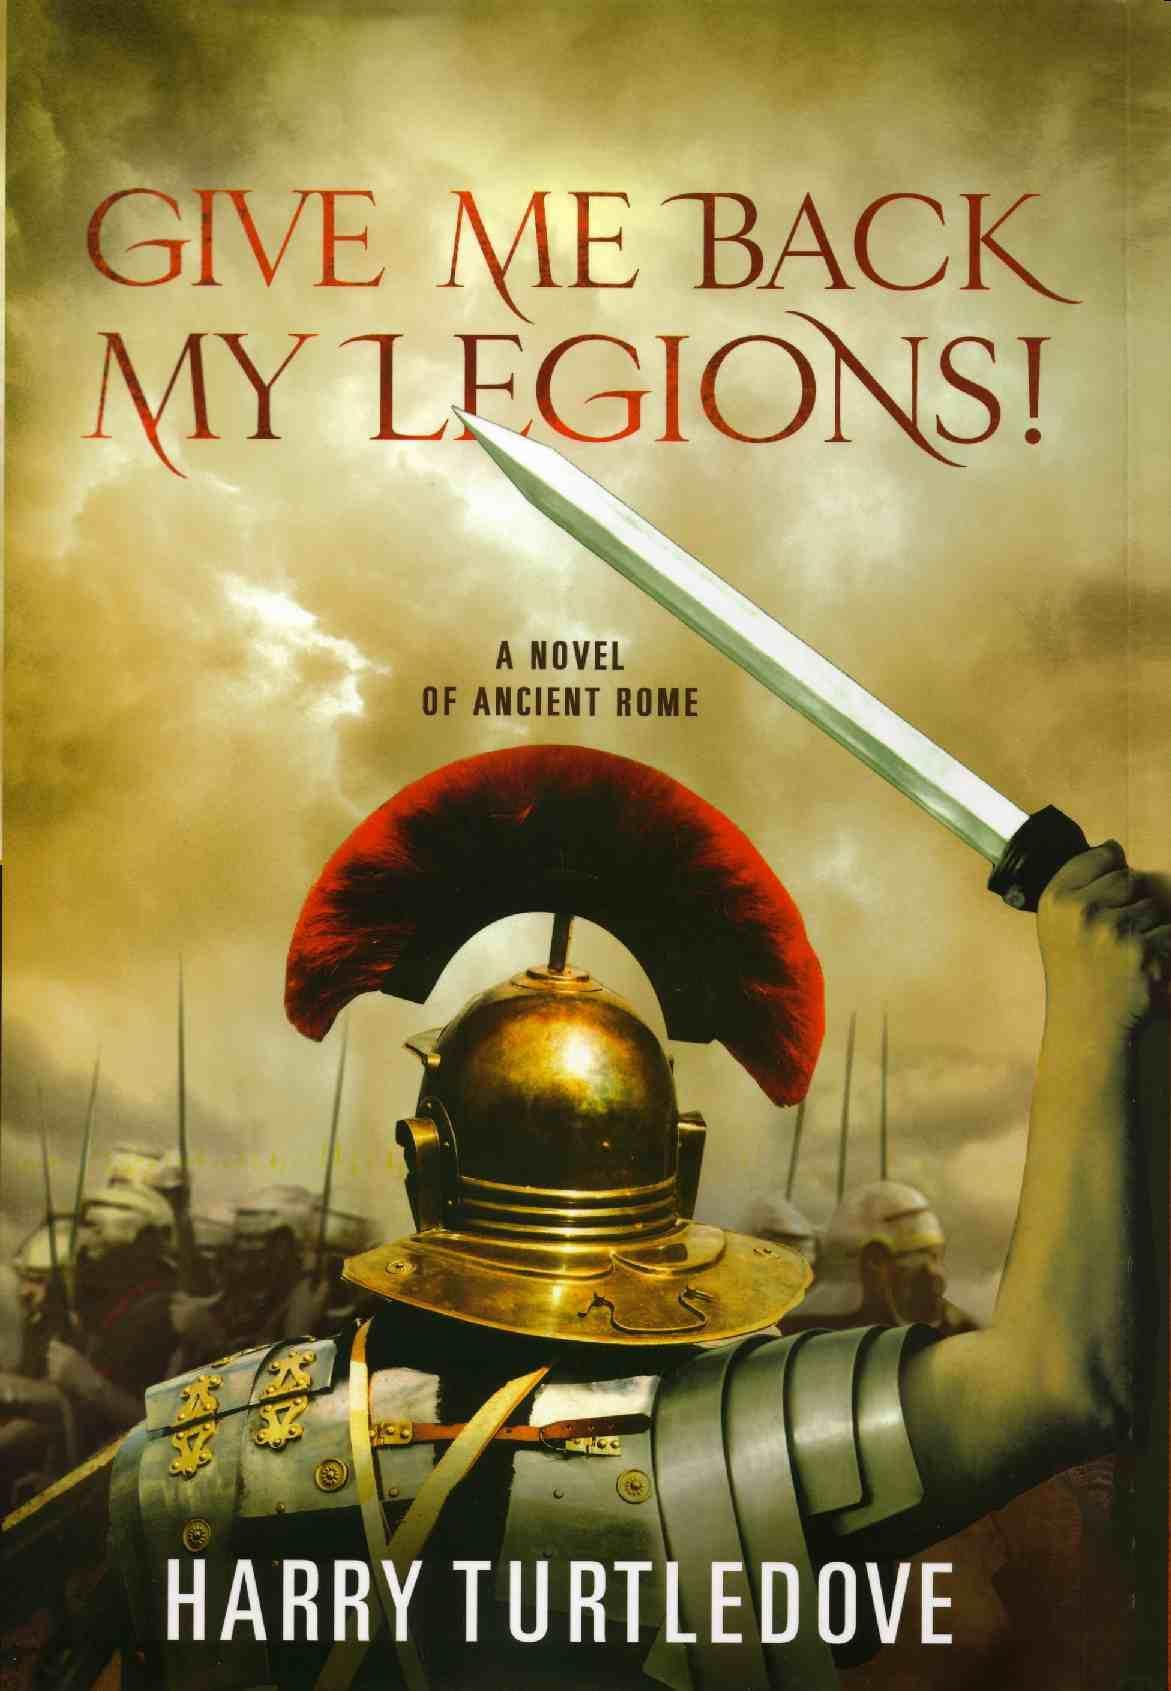 Turtledove Harry - Give me back my Legions!